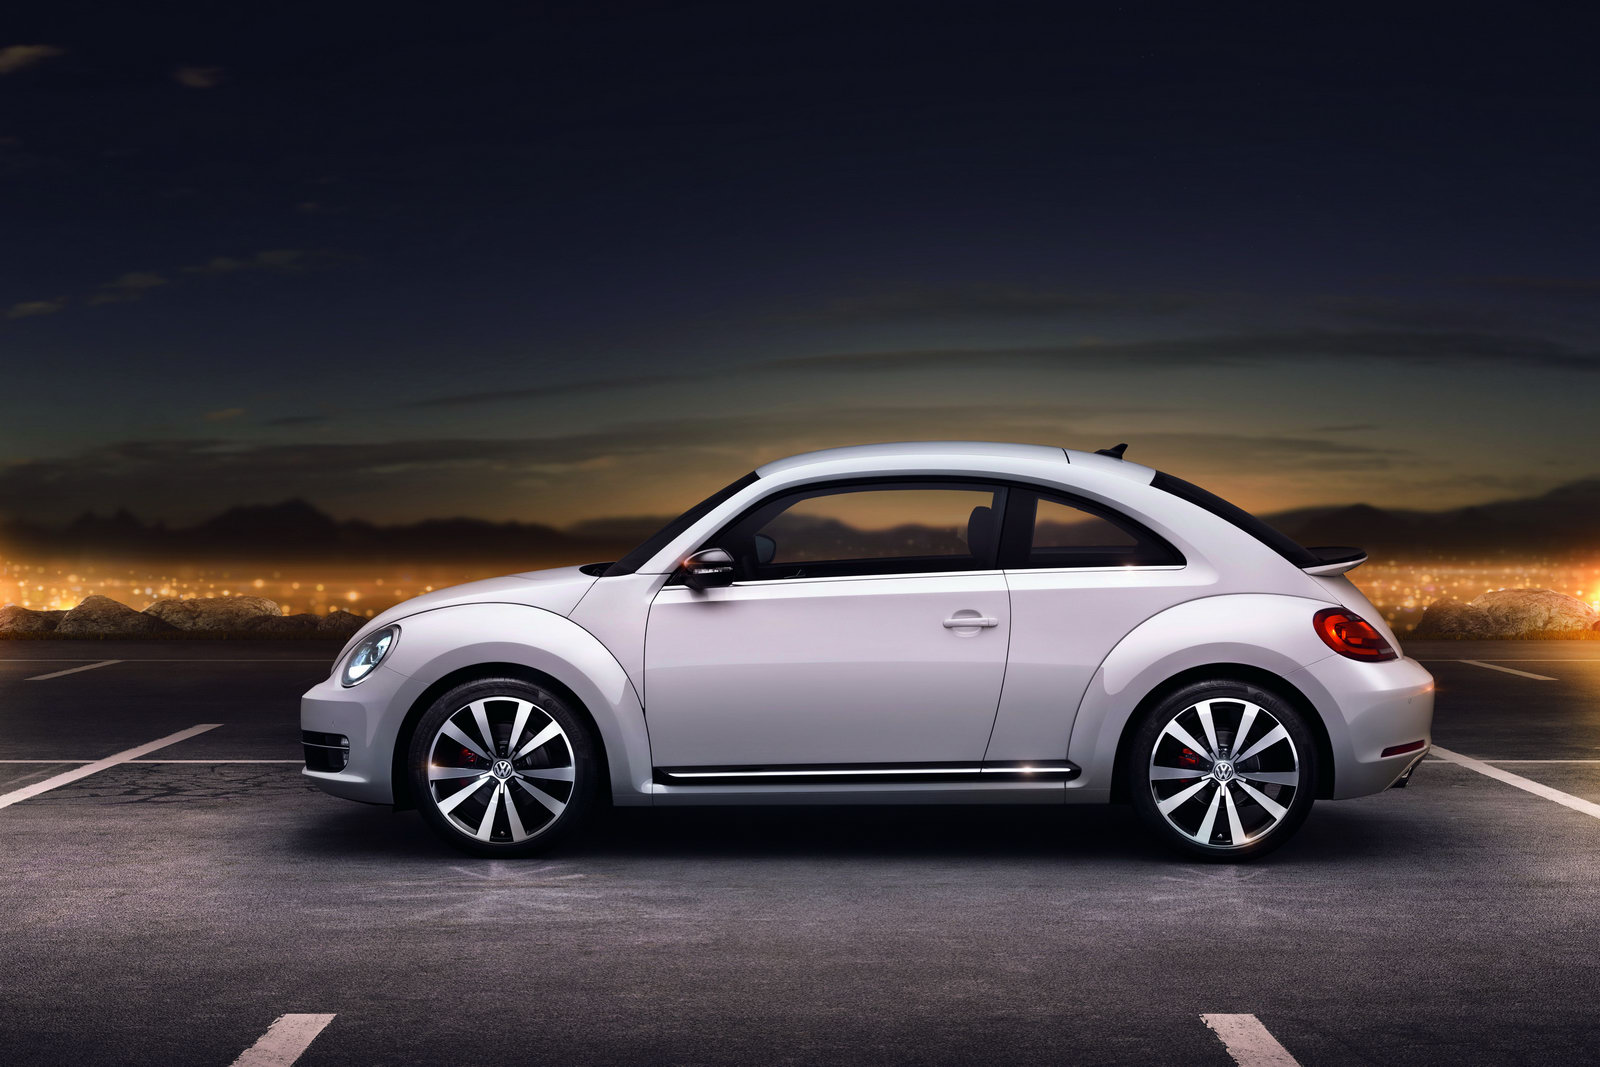 best car today scoop nouvelle volkswagen new beetle 3 photos beetle 2012. Black Bedroom Furniture Sets. Home Design Ideas